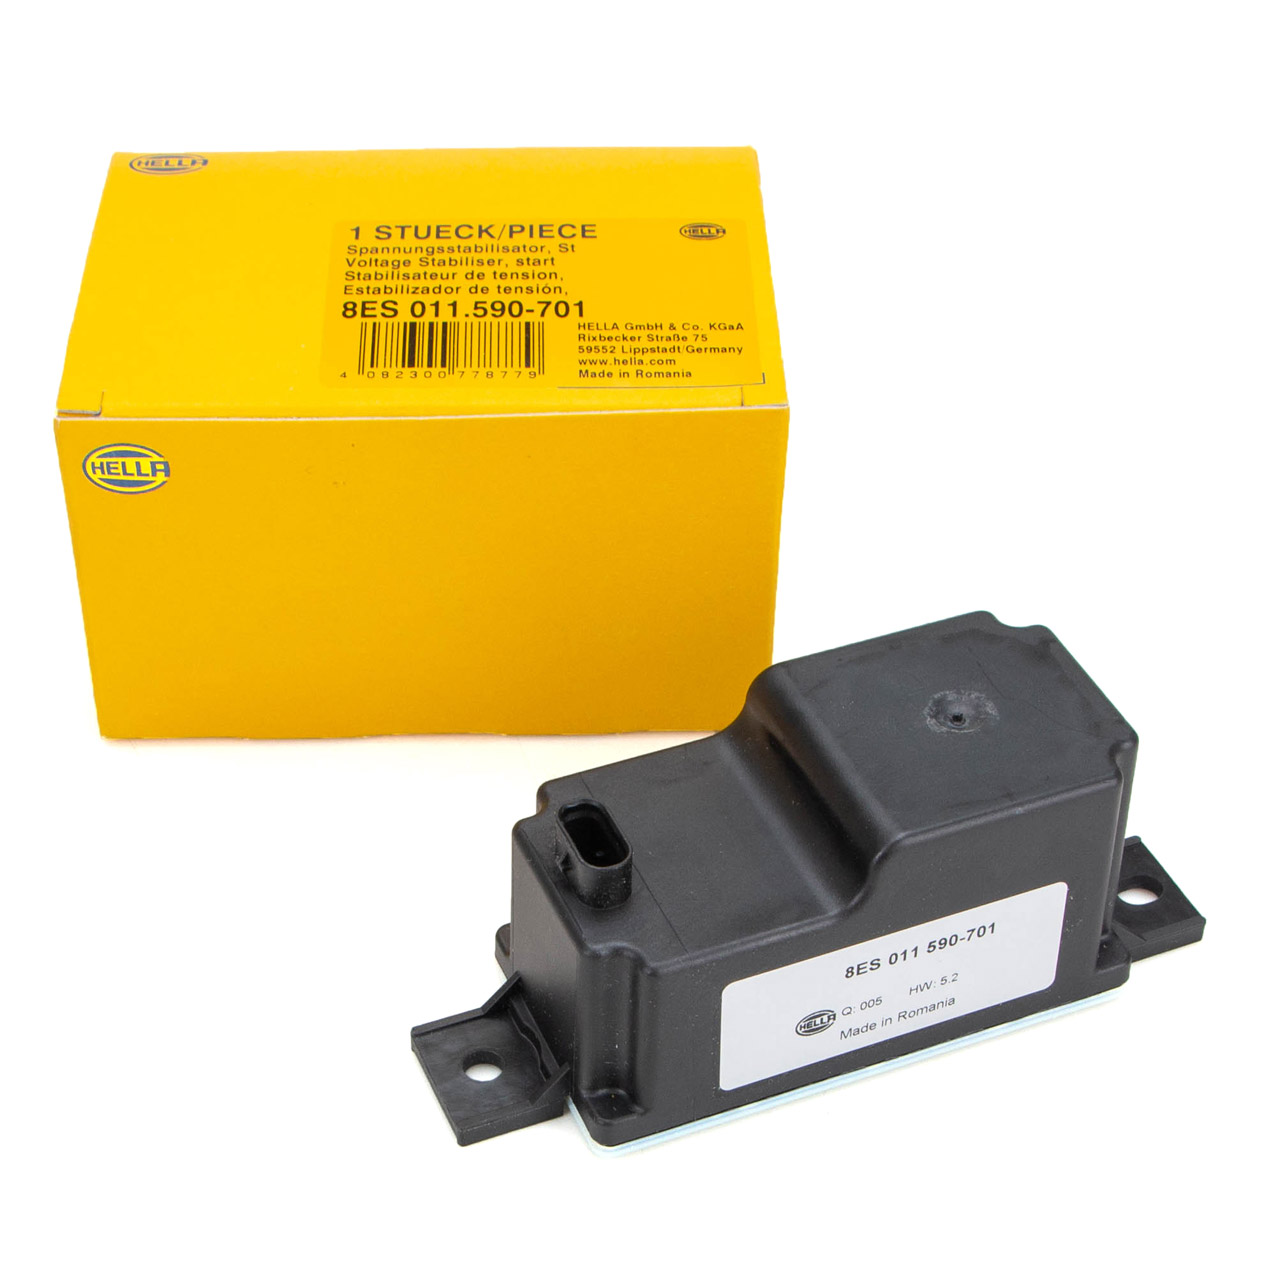 HELLA Spannungsstabilisator Start-/Stopp-System MERCEDES W205 W213 X253 W167 2059053414